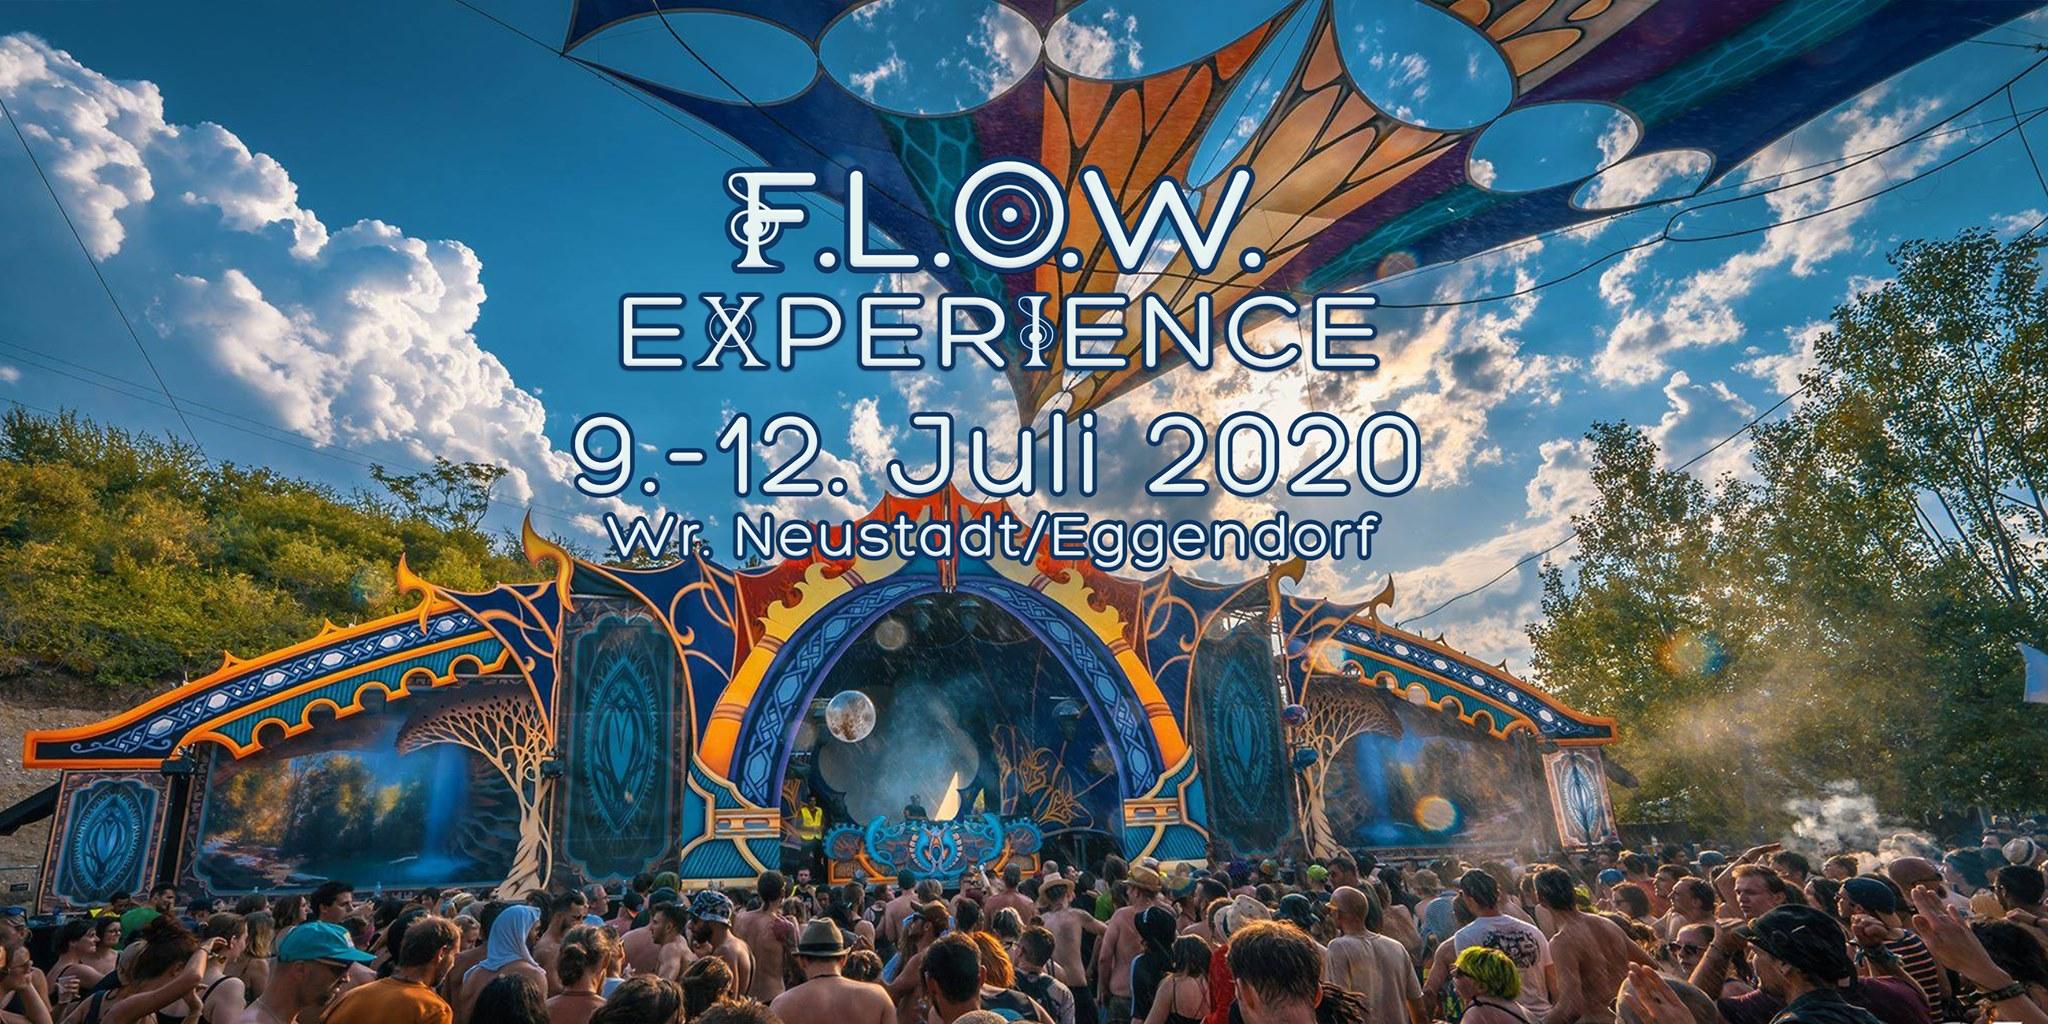 Mushroom Festival 2020.Flow Experience Austria 09 07 2020 12 07 2020